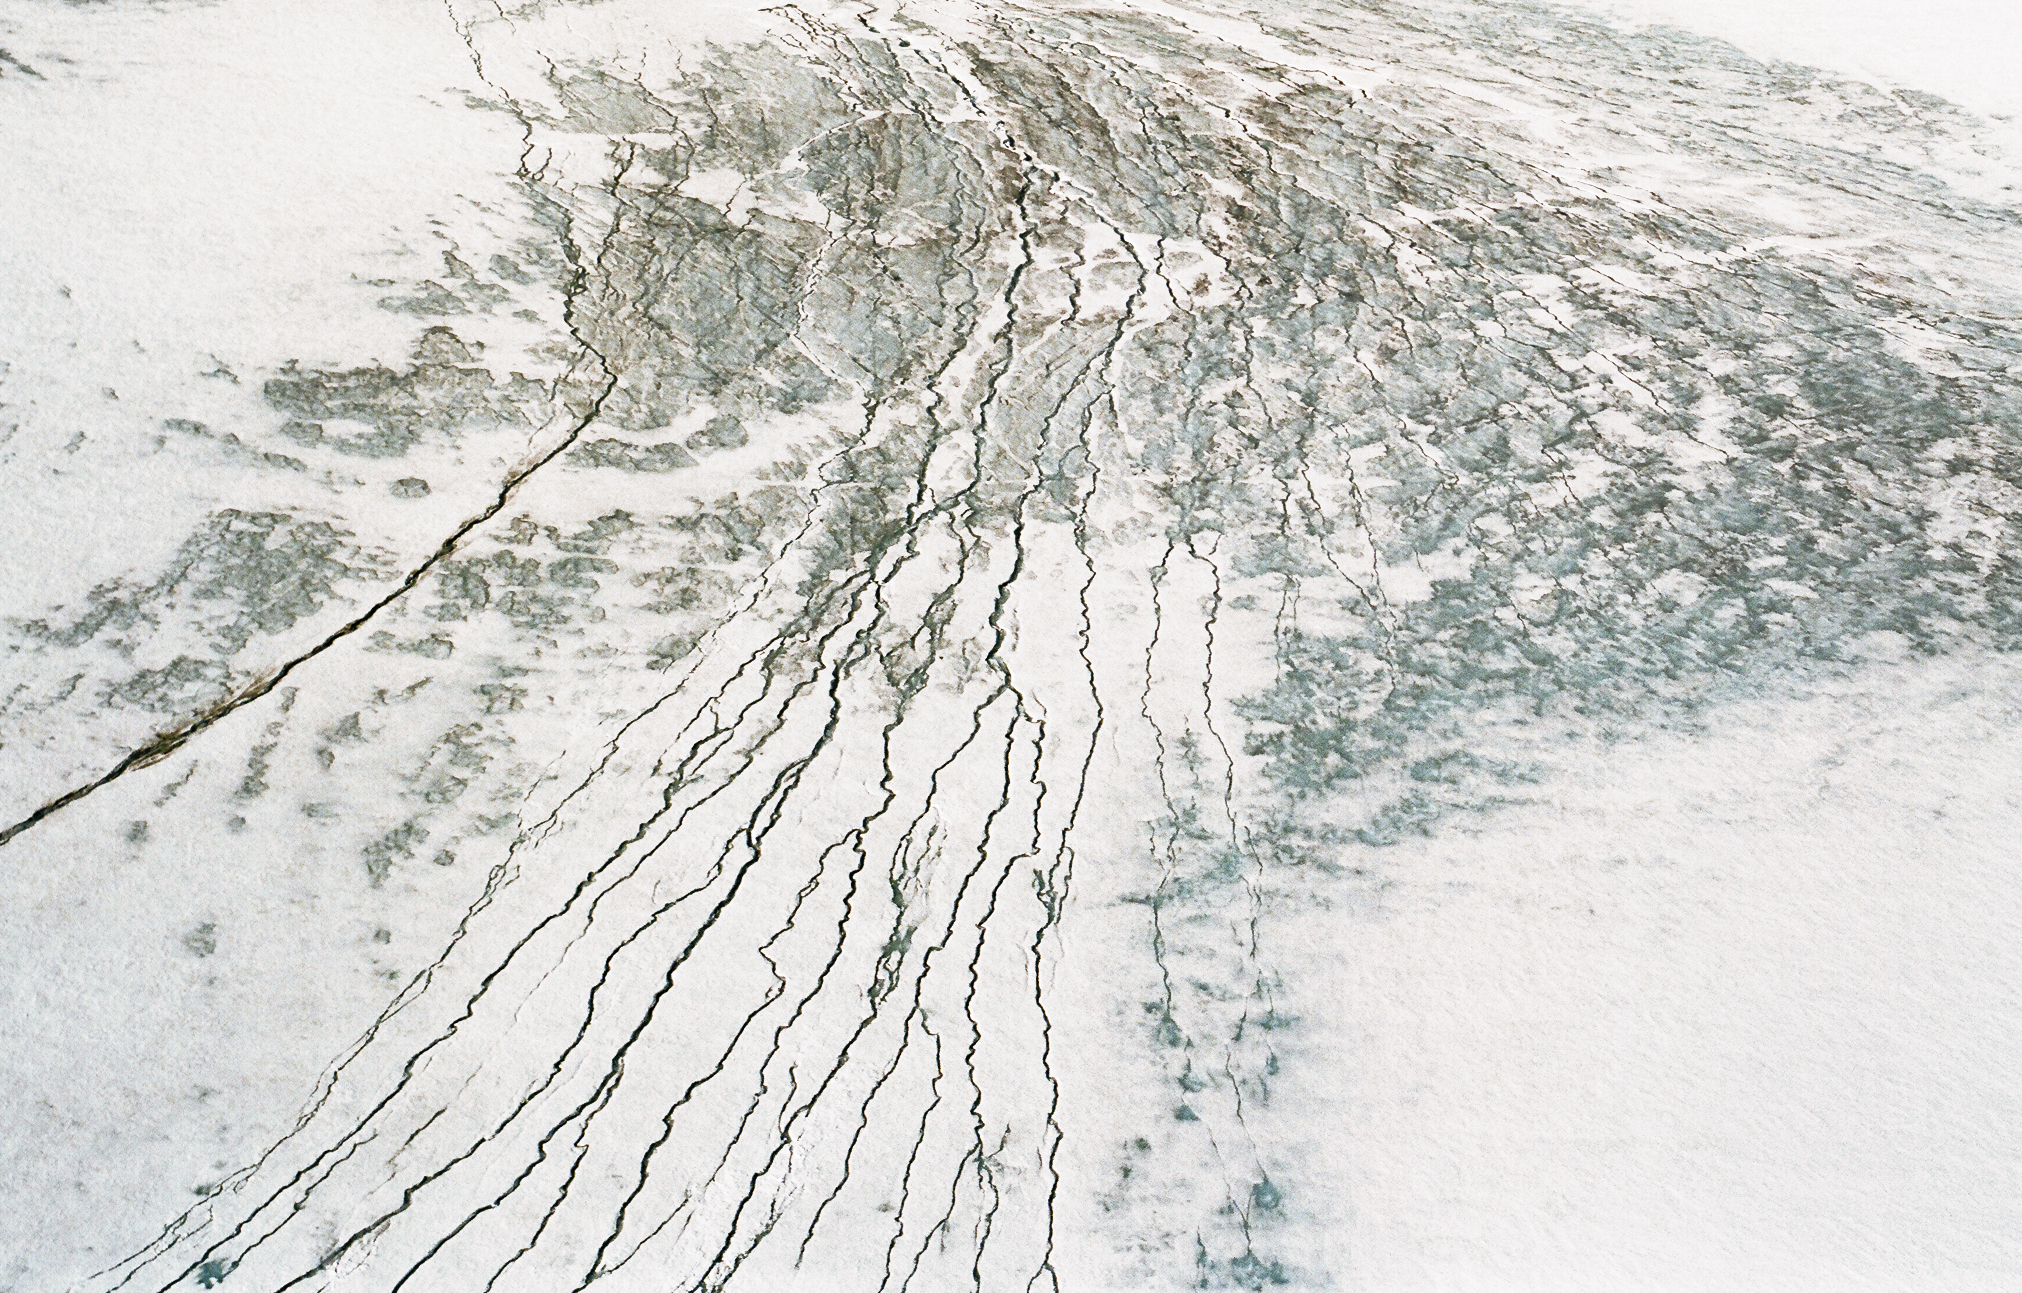 grinnell glacier/canada